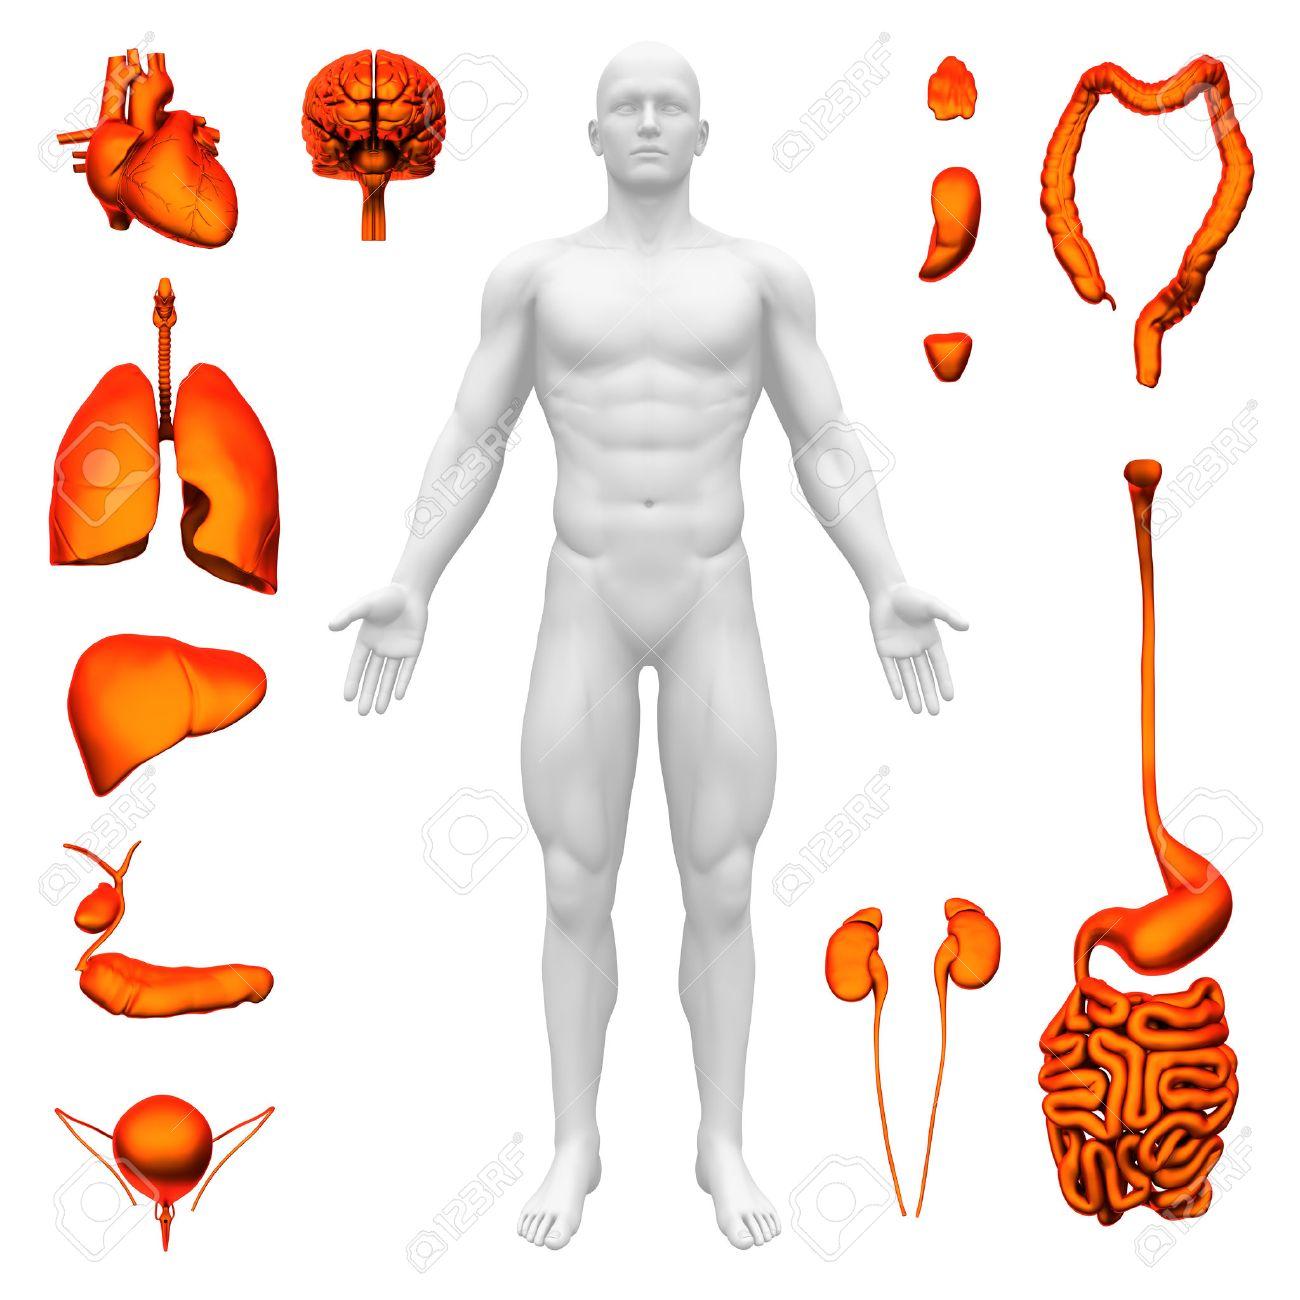 Internal organs - Human anatomy Stock Photo - 22971542